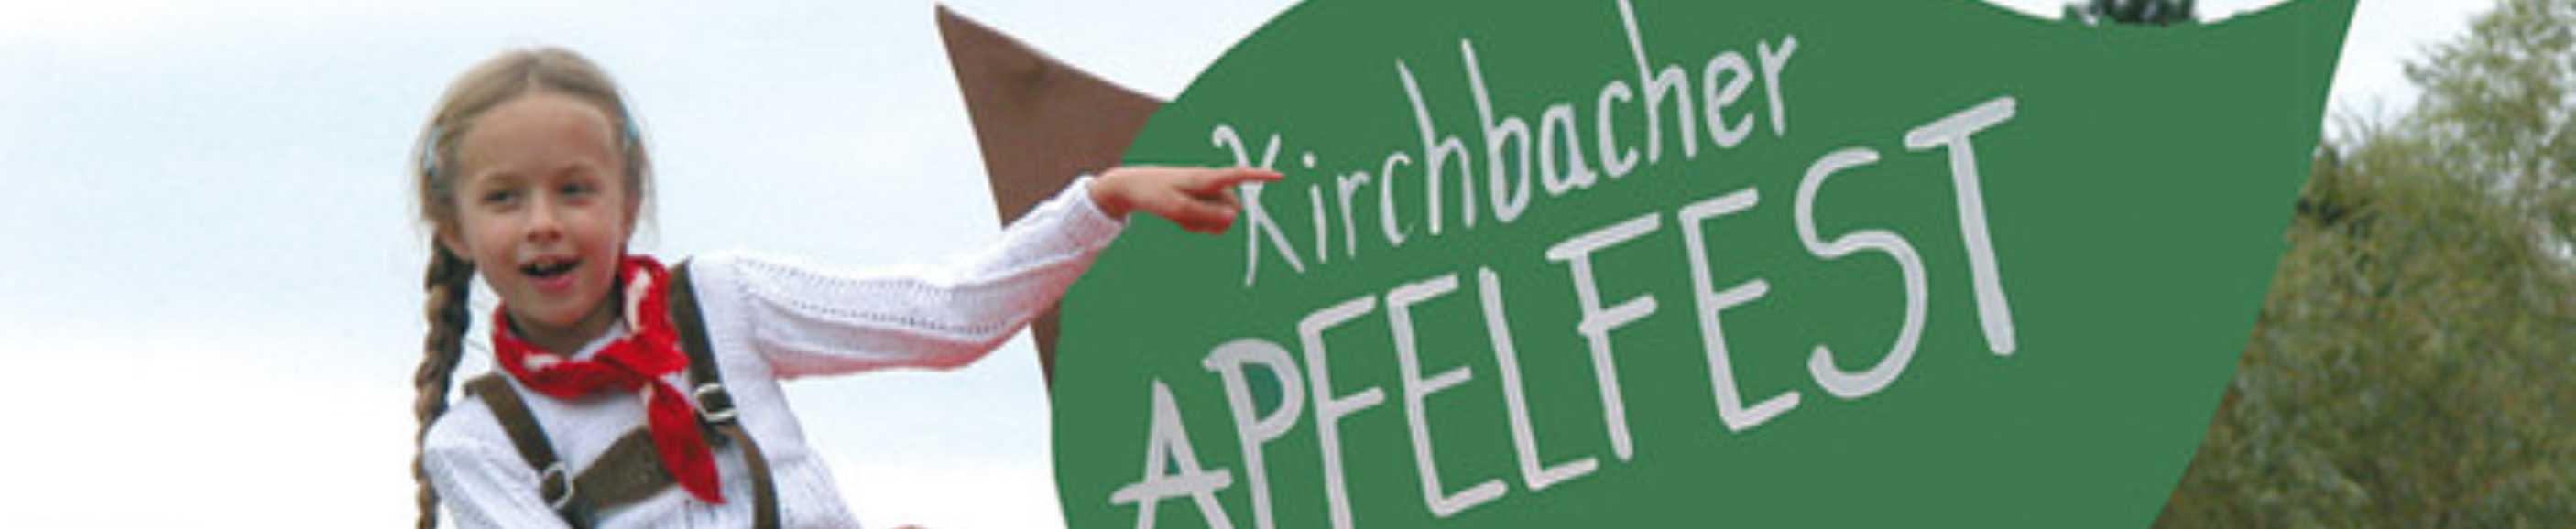 15 Kirchbacher Apfelfest 2017